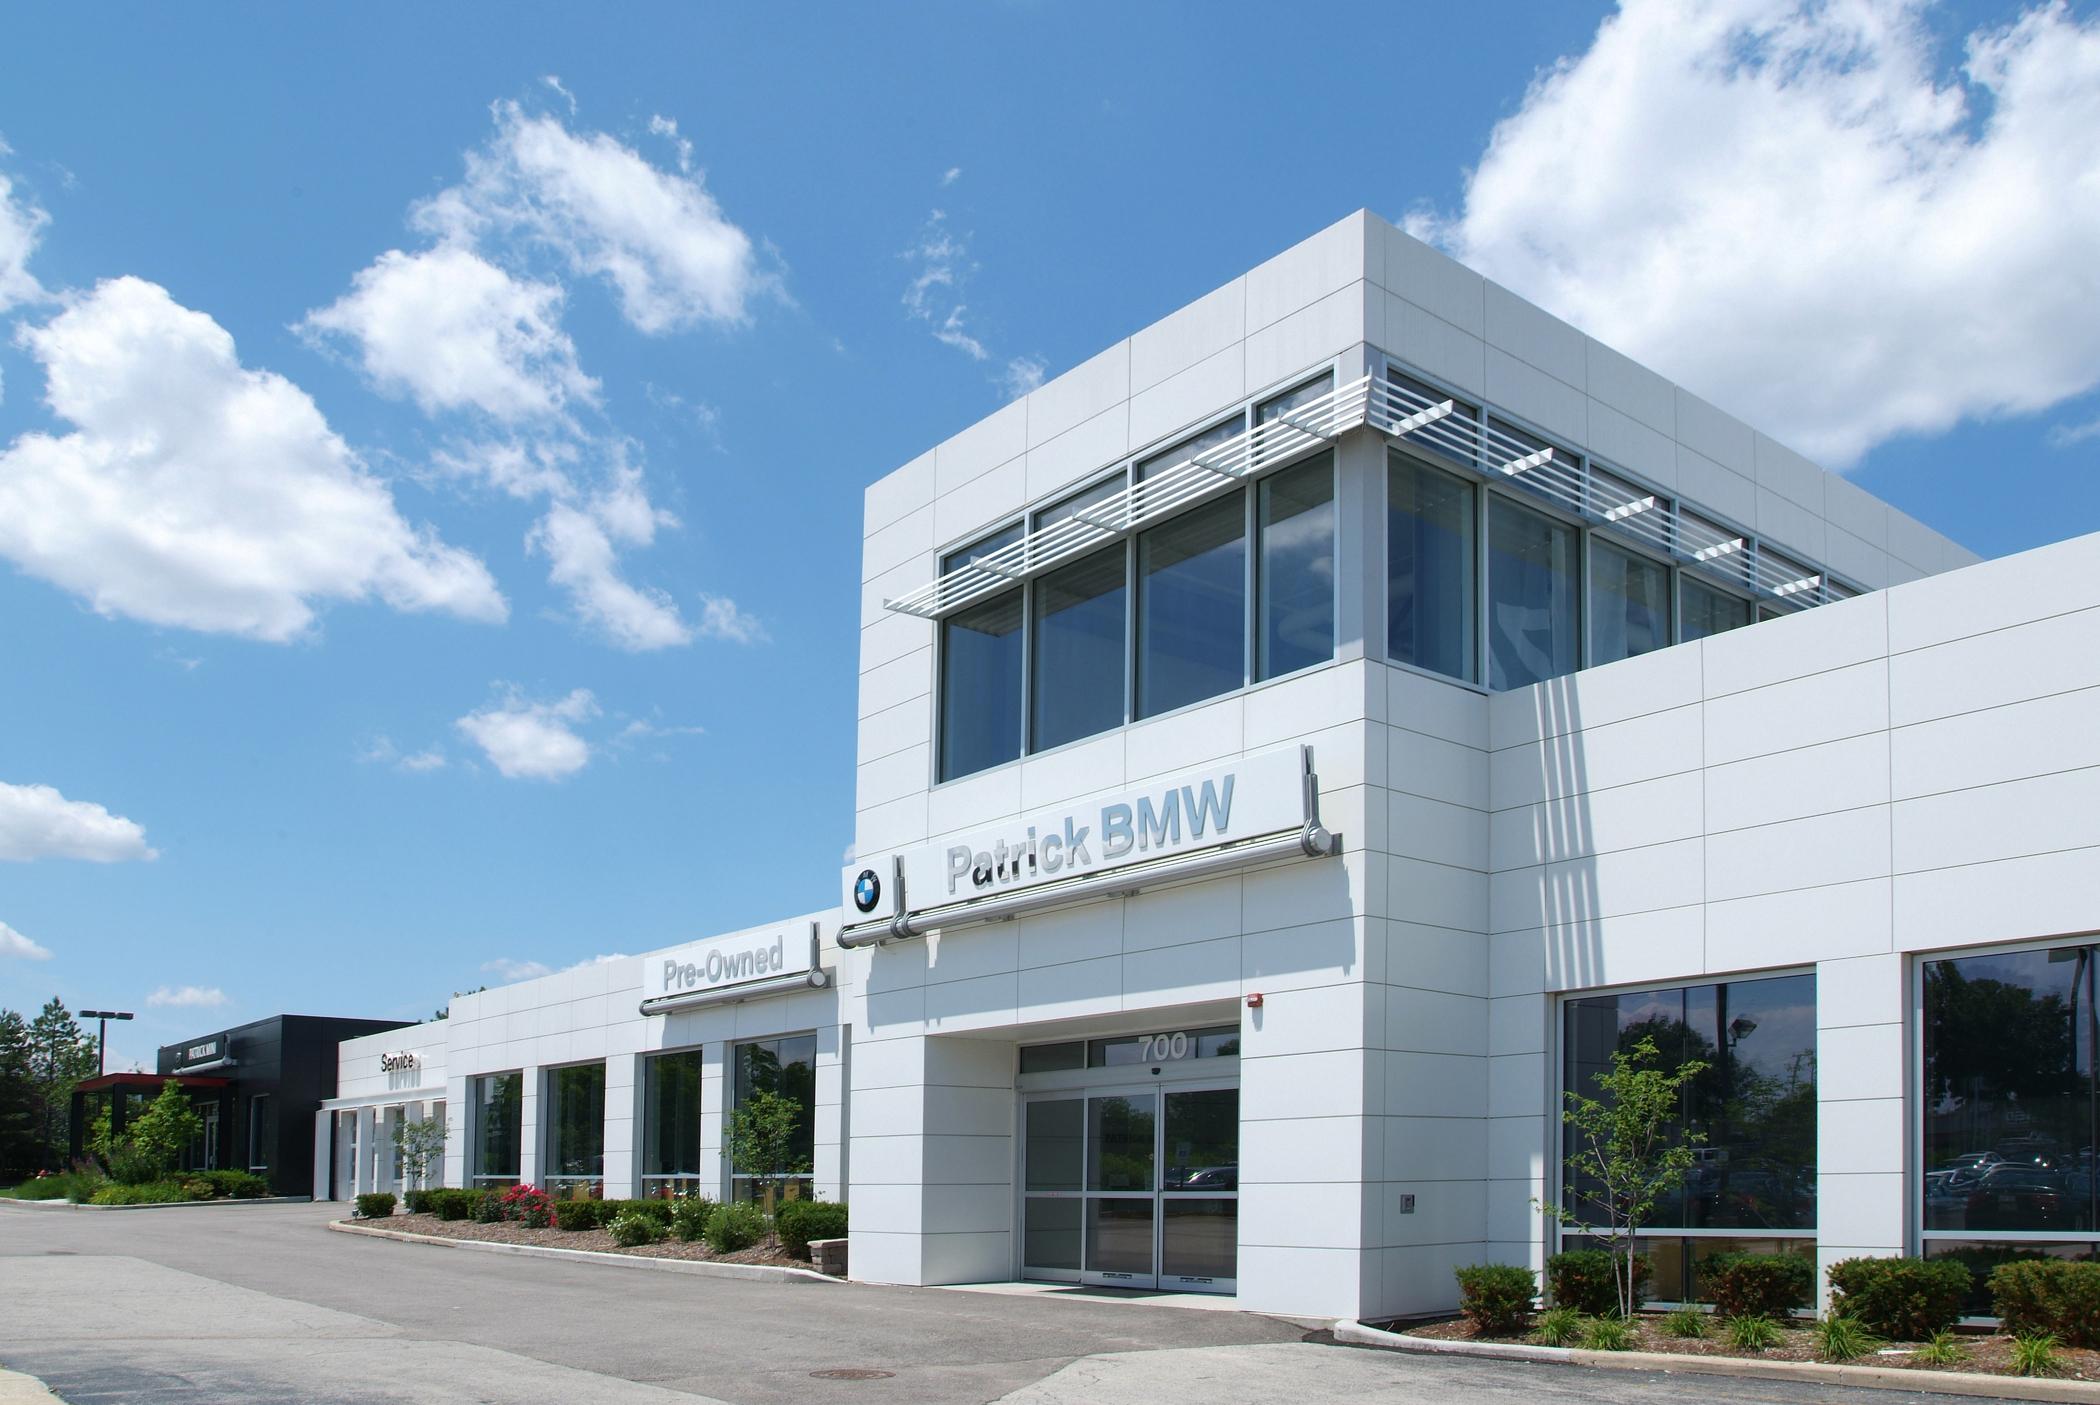 Patrick BMW Dealership